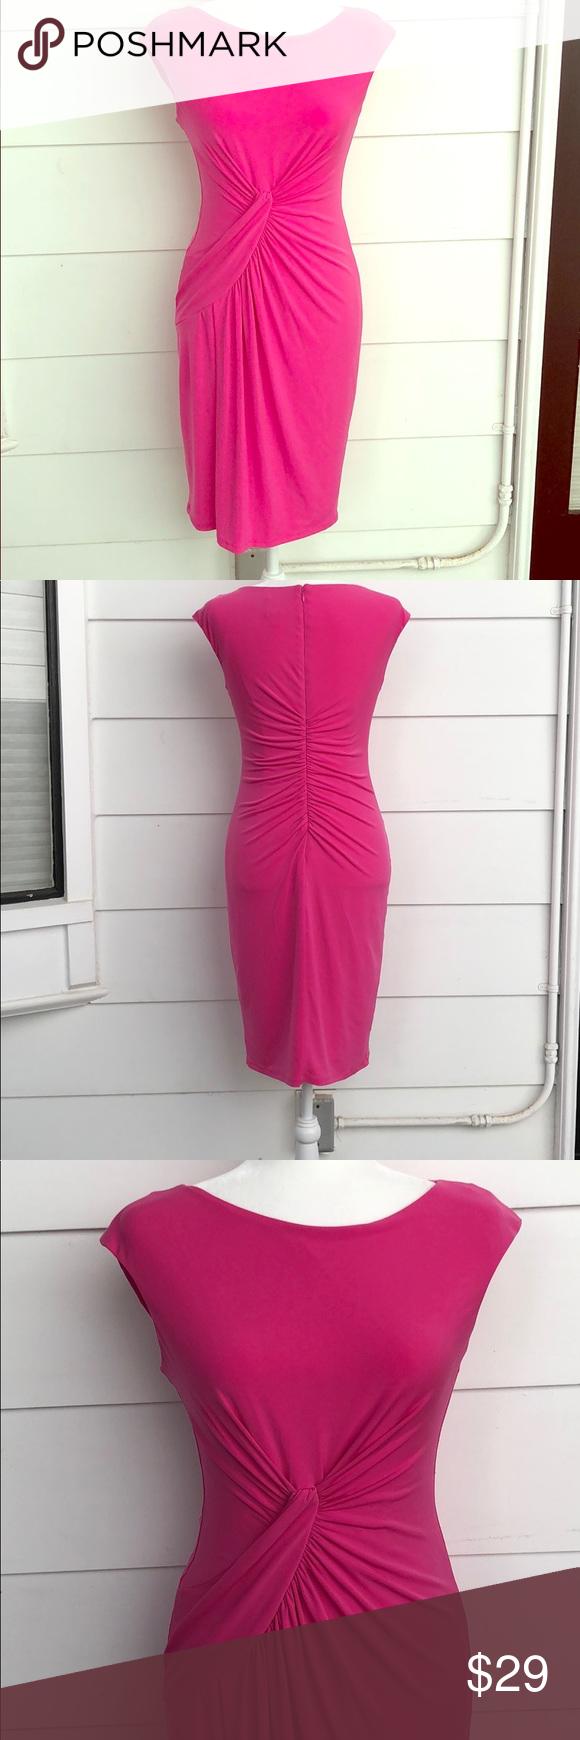 Vince Camuto Beautiful Spring Pink Dress Pink Dress Form Pink Dress Dresses [ 1740 x 580 Pixel ]